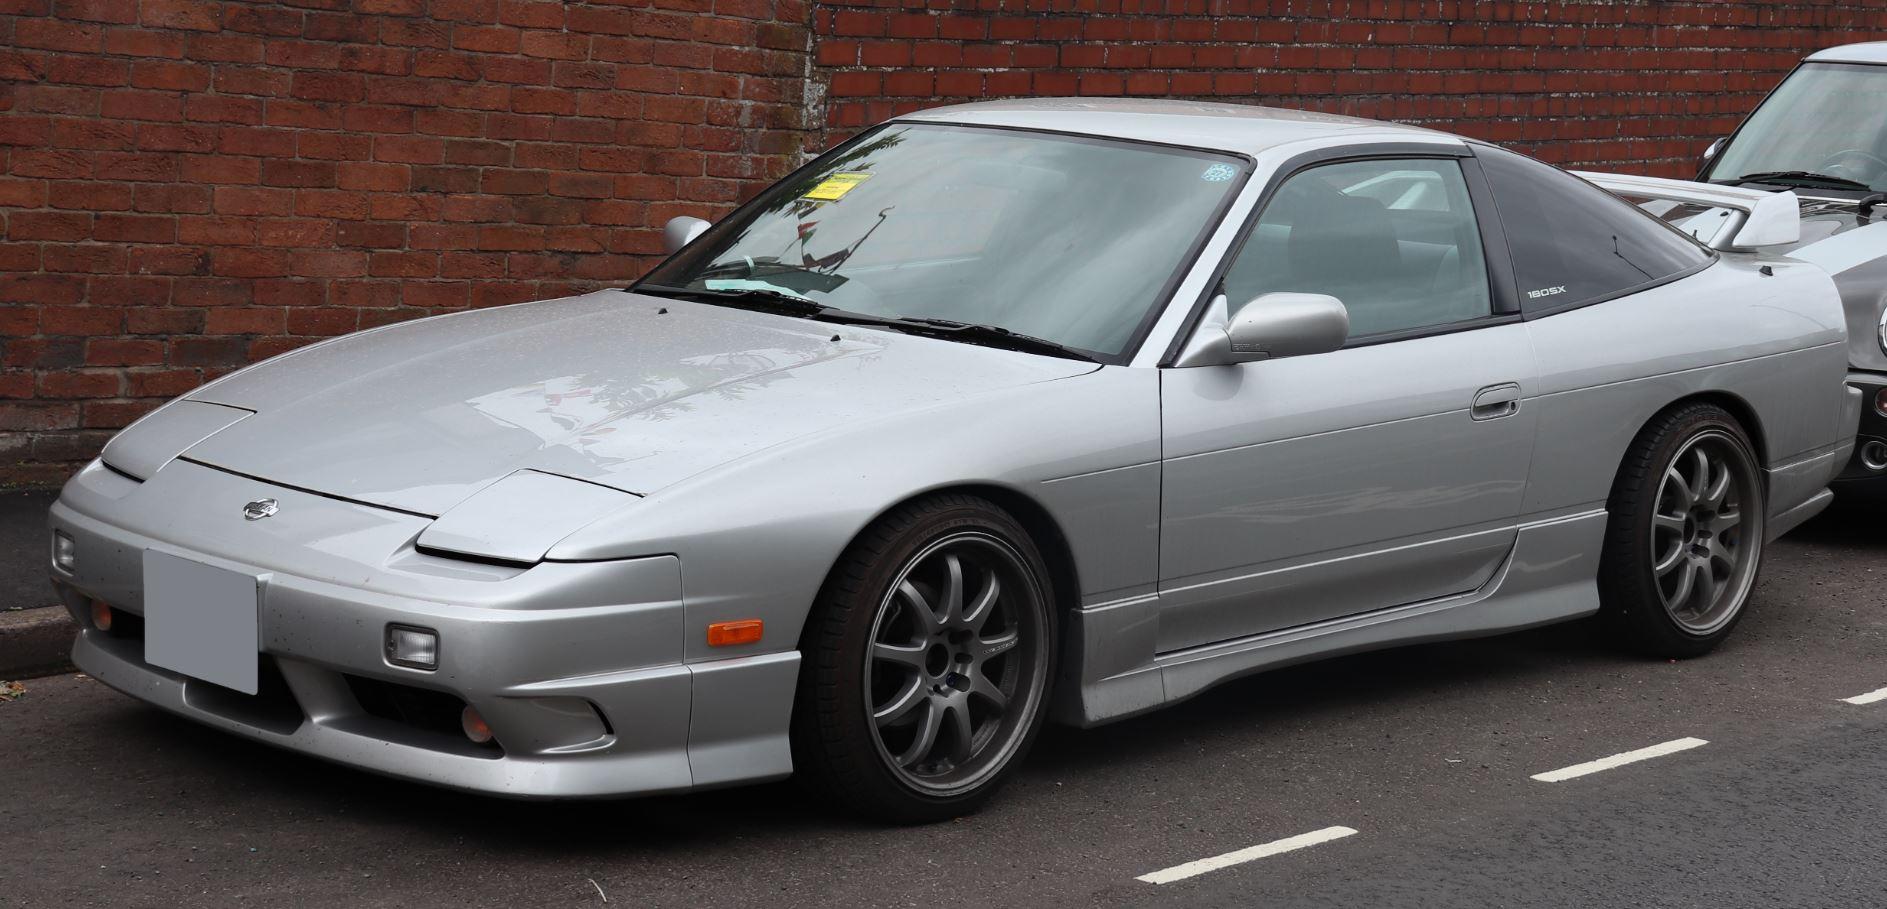 Nissan 240sx 180sx S13 Silvia Buyer S Guide Garage Dreams